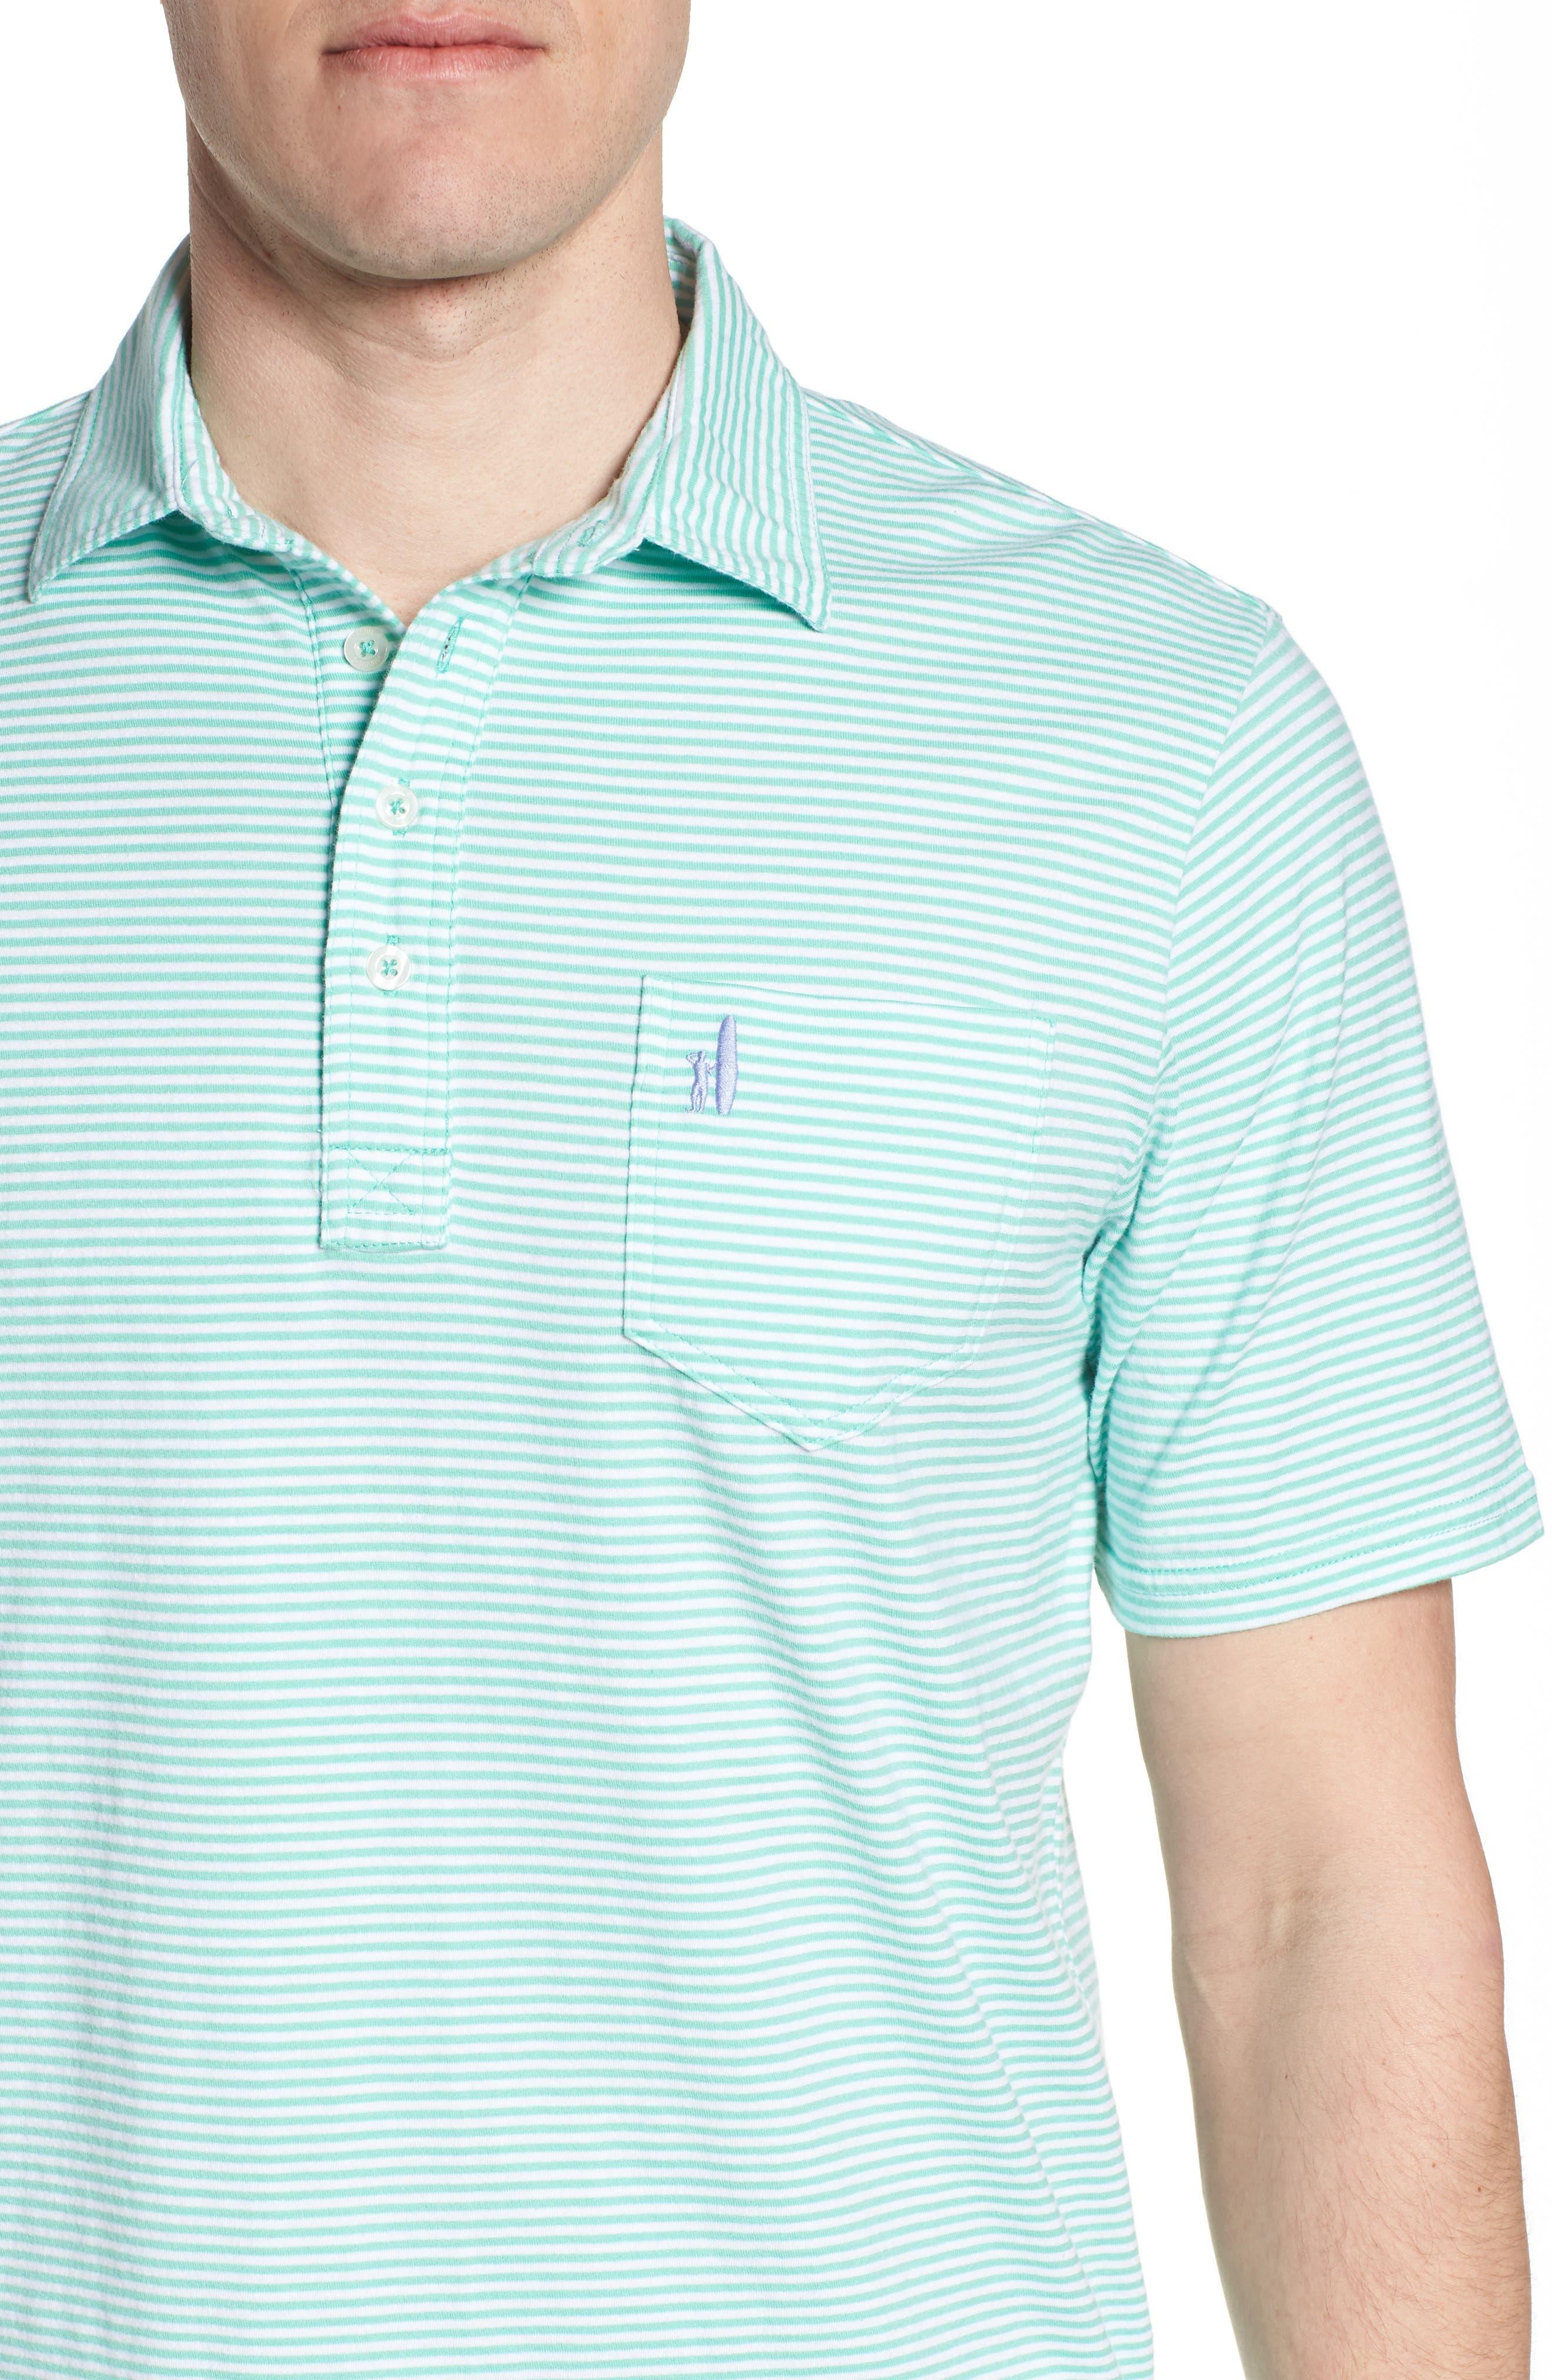 JOHNNIE-O,                             Jack Stripe Jersey Polo,                             Alternate thumbnail 4, color,                             339